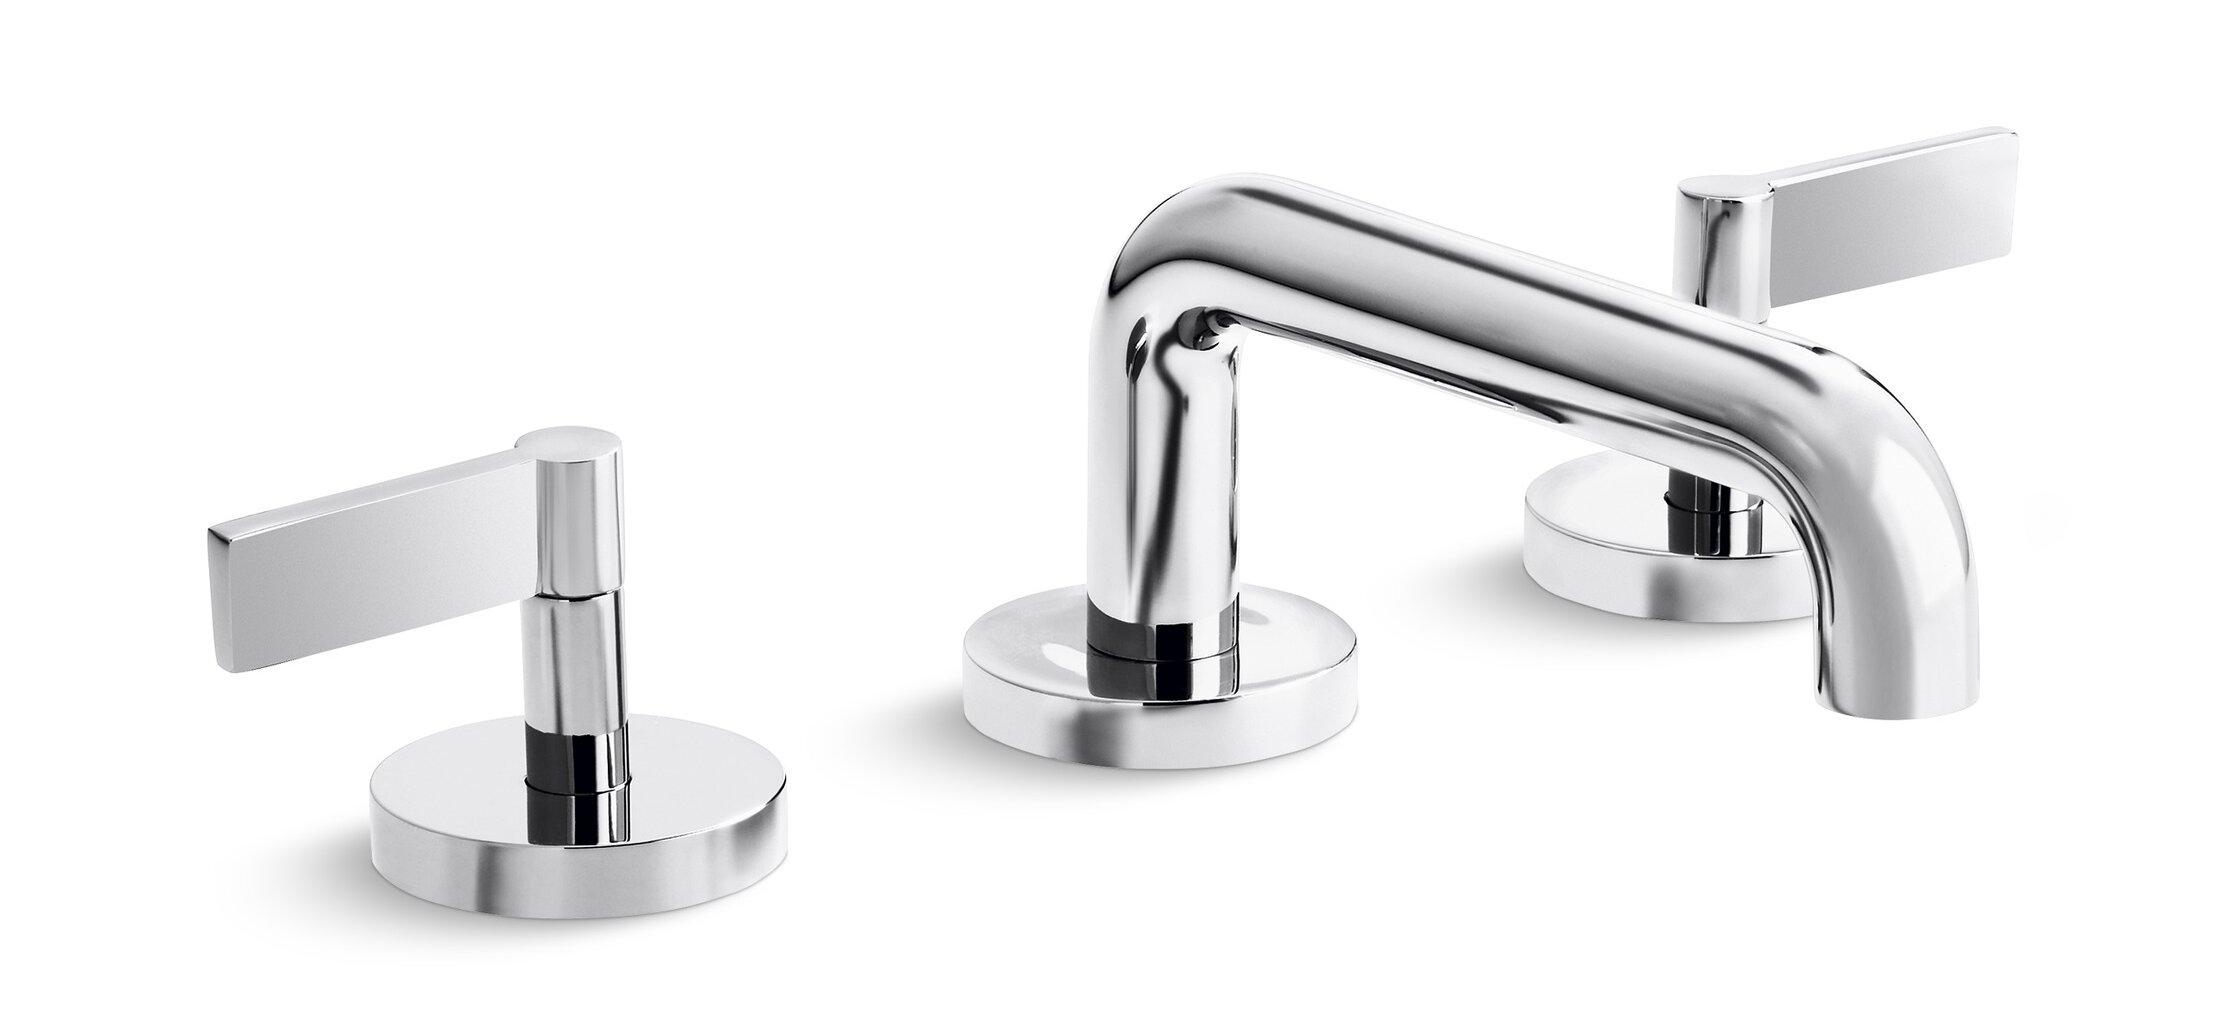 Kallista One Widespread Bathroom Faucet   Wayfair